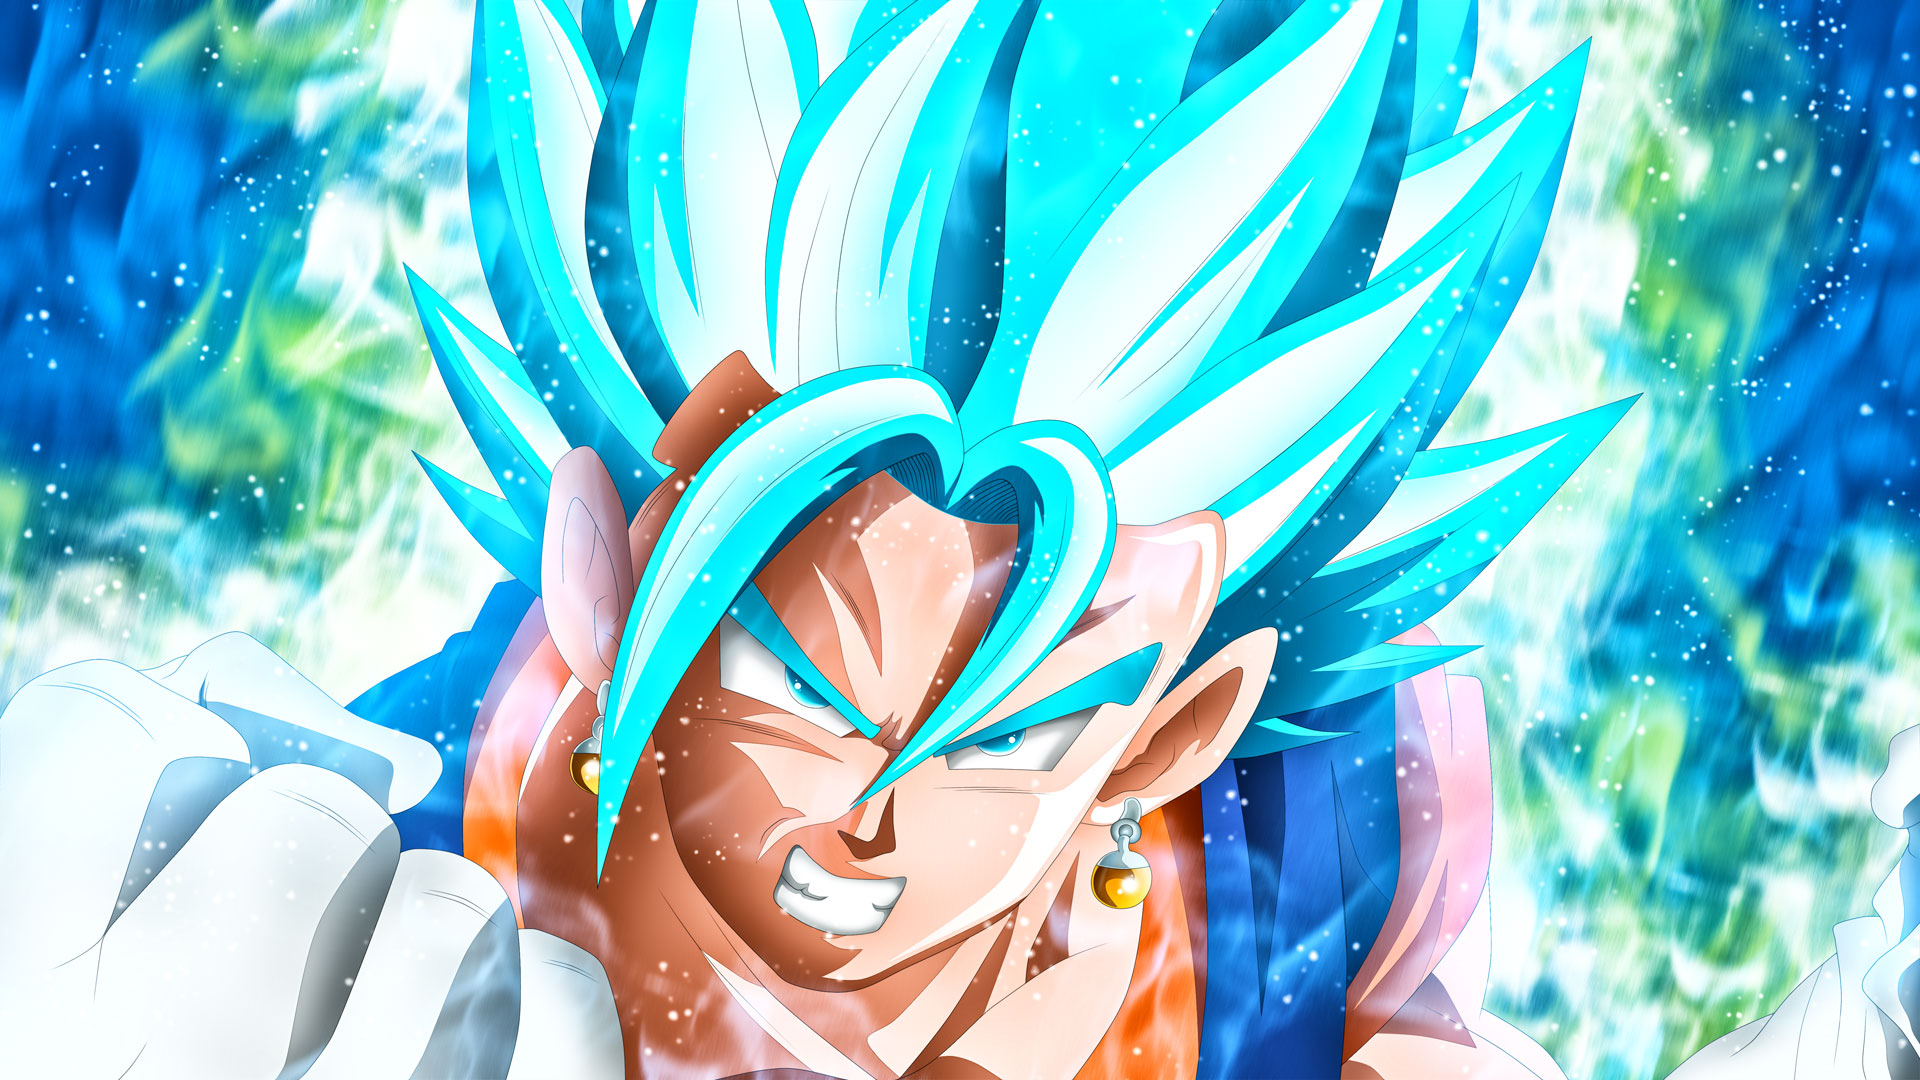 Vegito Super Saiyan Blue 3 Ps4wallpapers Com